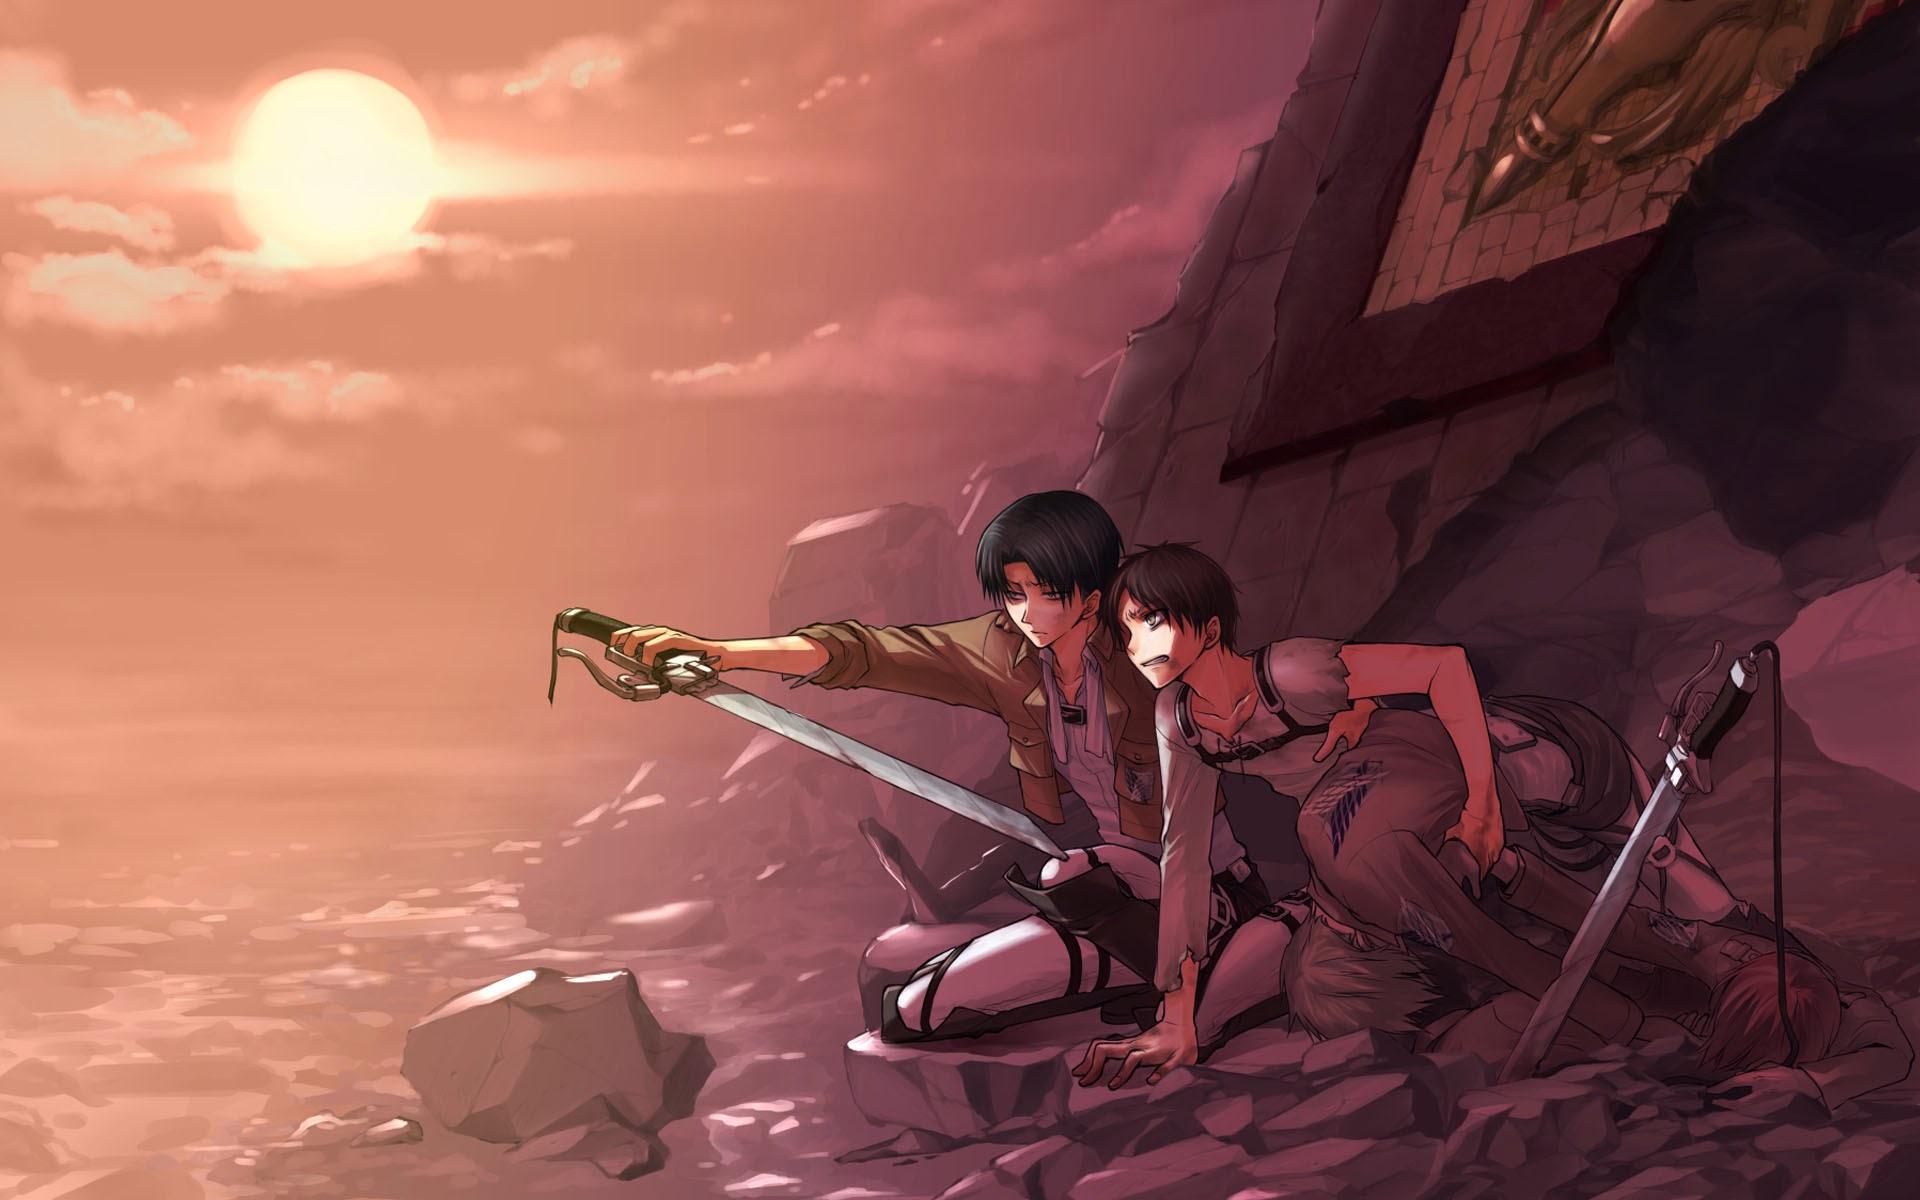 50 Levi Attack On Titan Wallpaper On Wallpapersafari